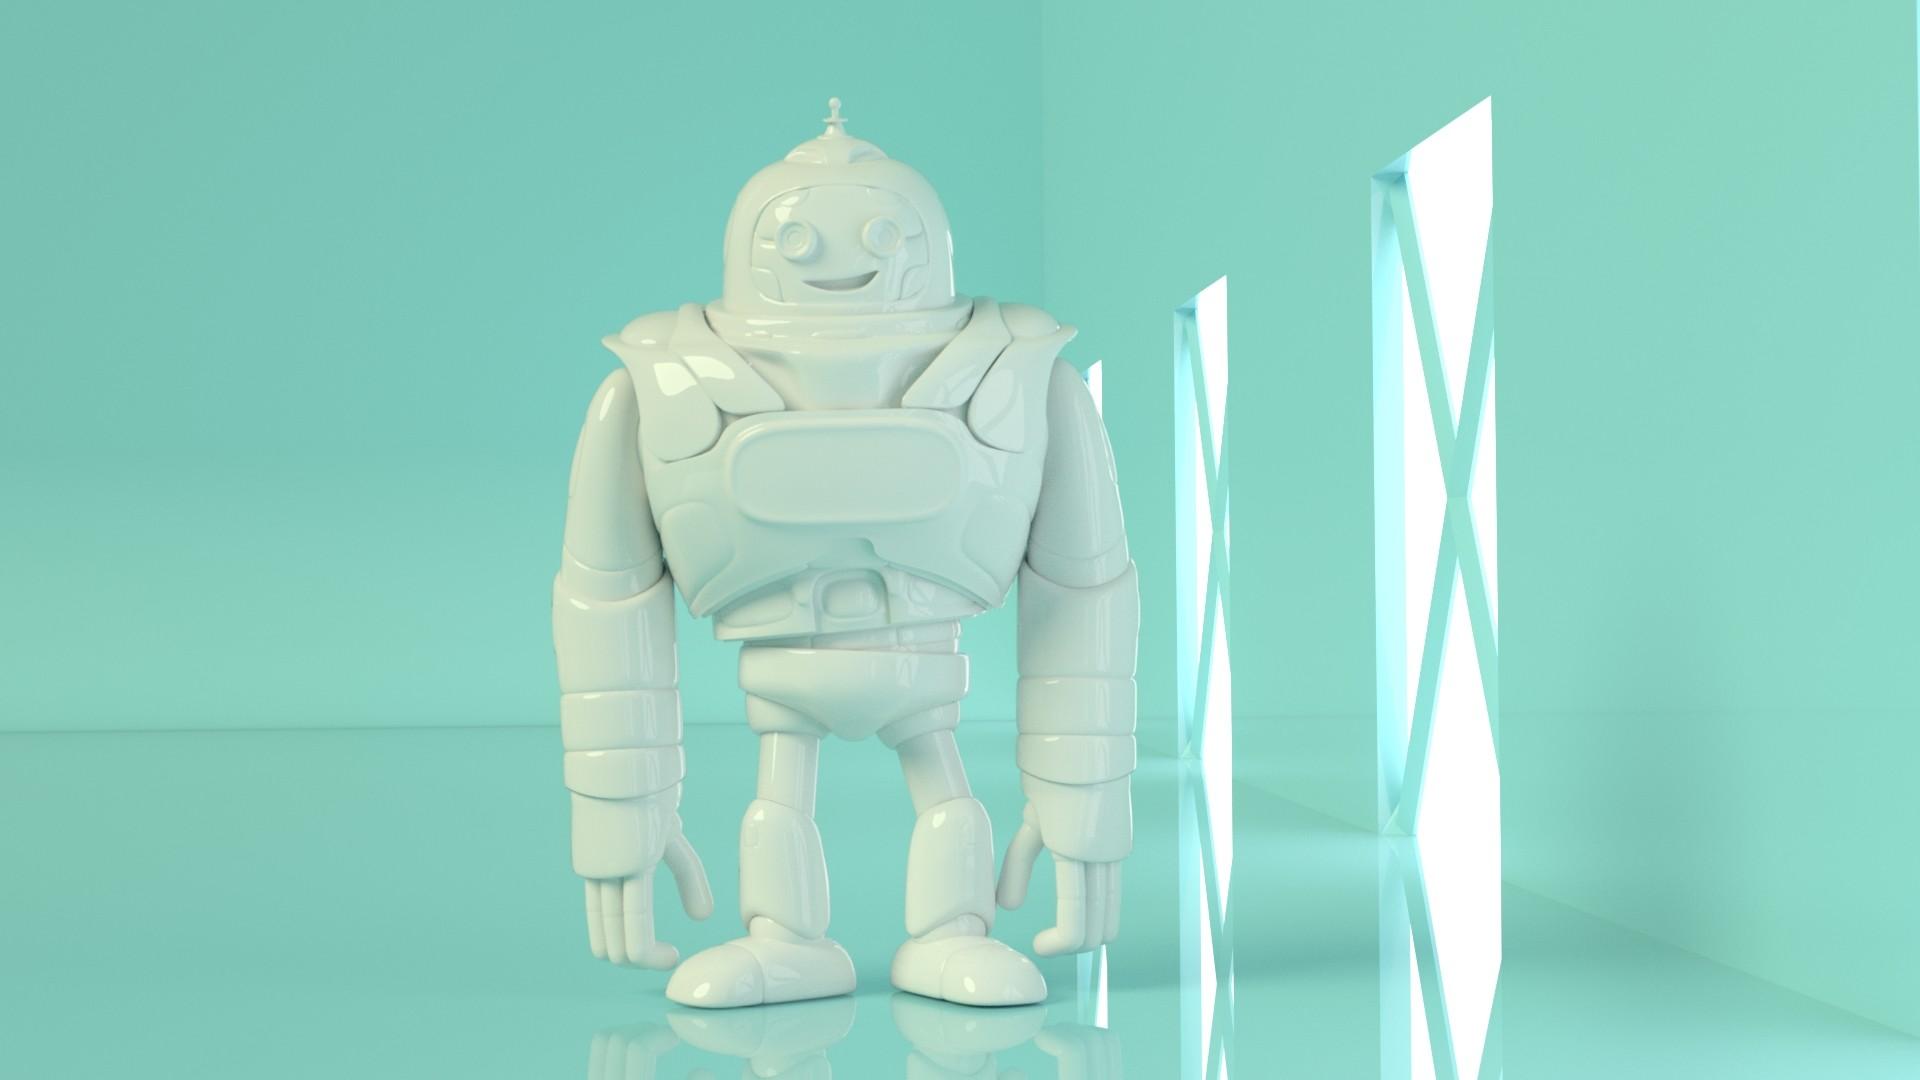 Michael wu 28 robot